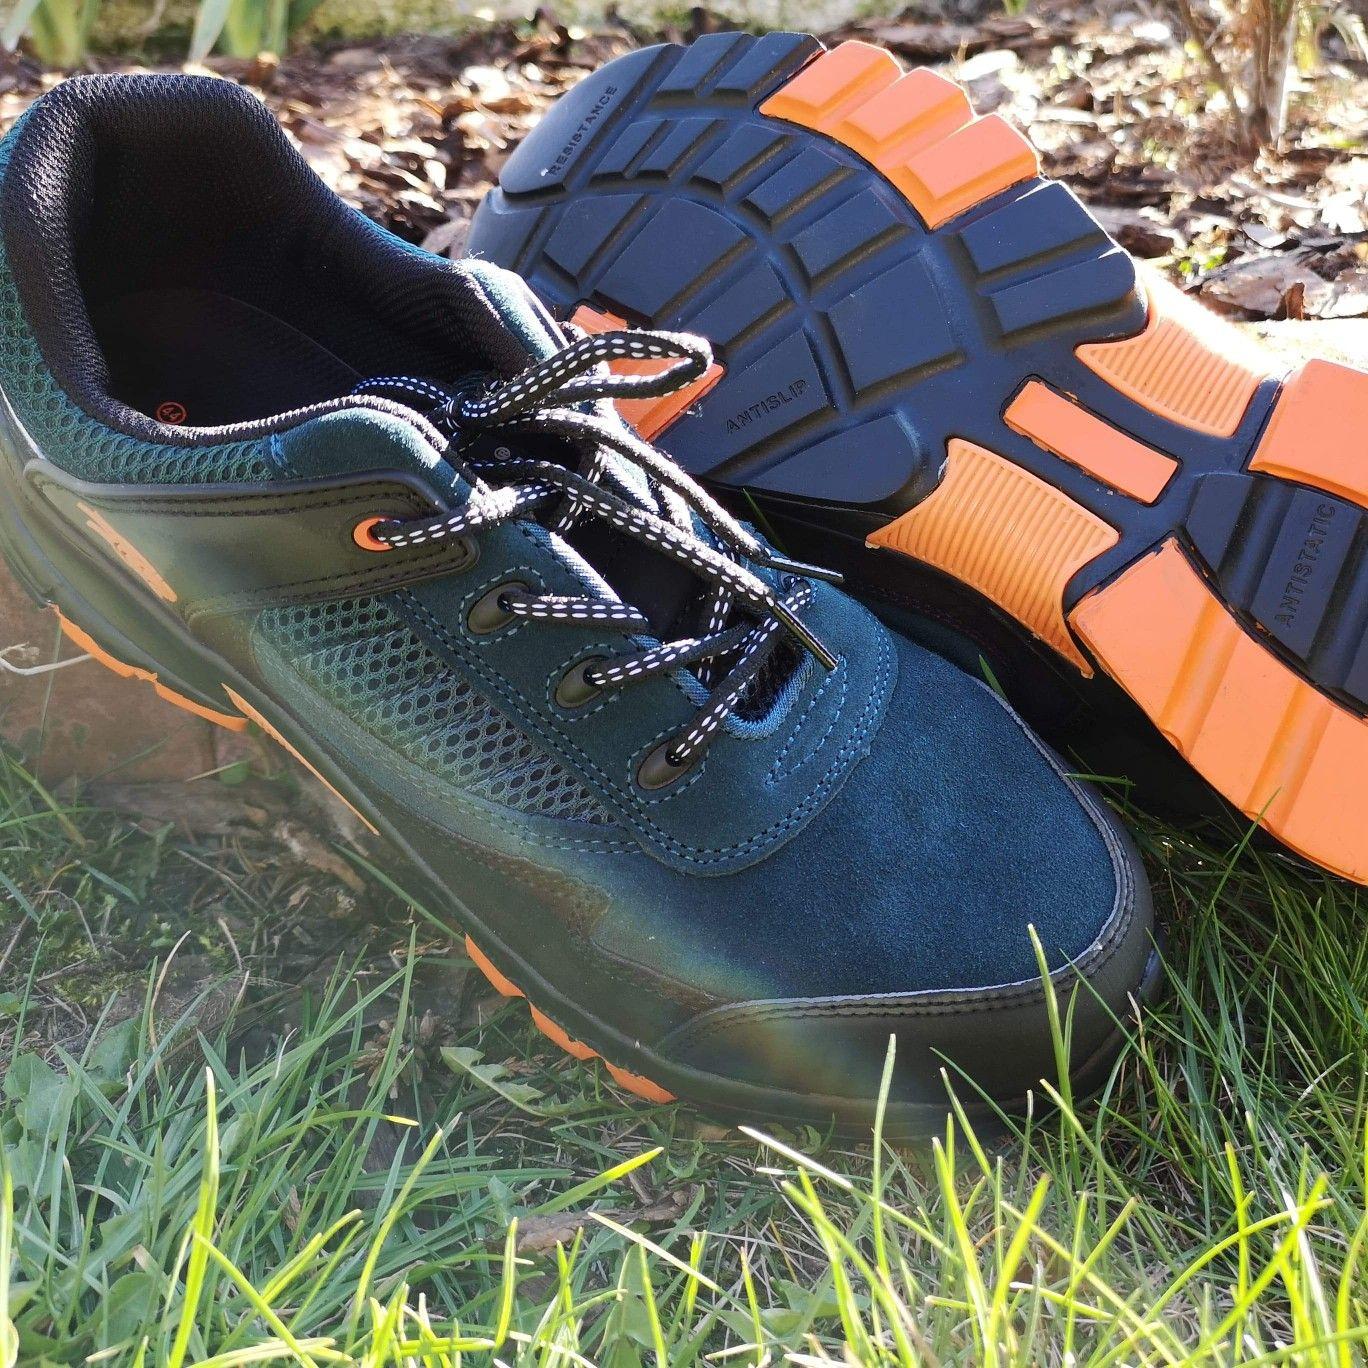 Polbuty Ochronne Bpz S1 Z Podnoskiem Hiking Boots Shoes Boots